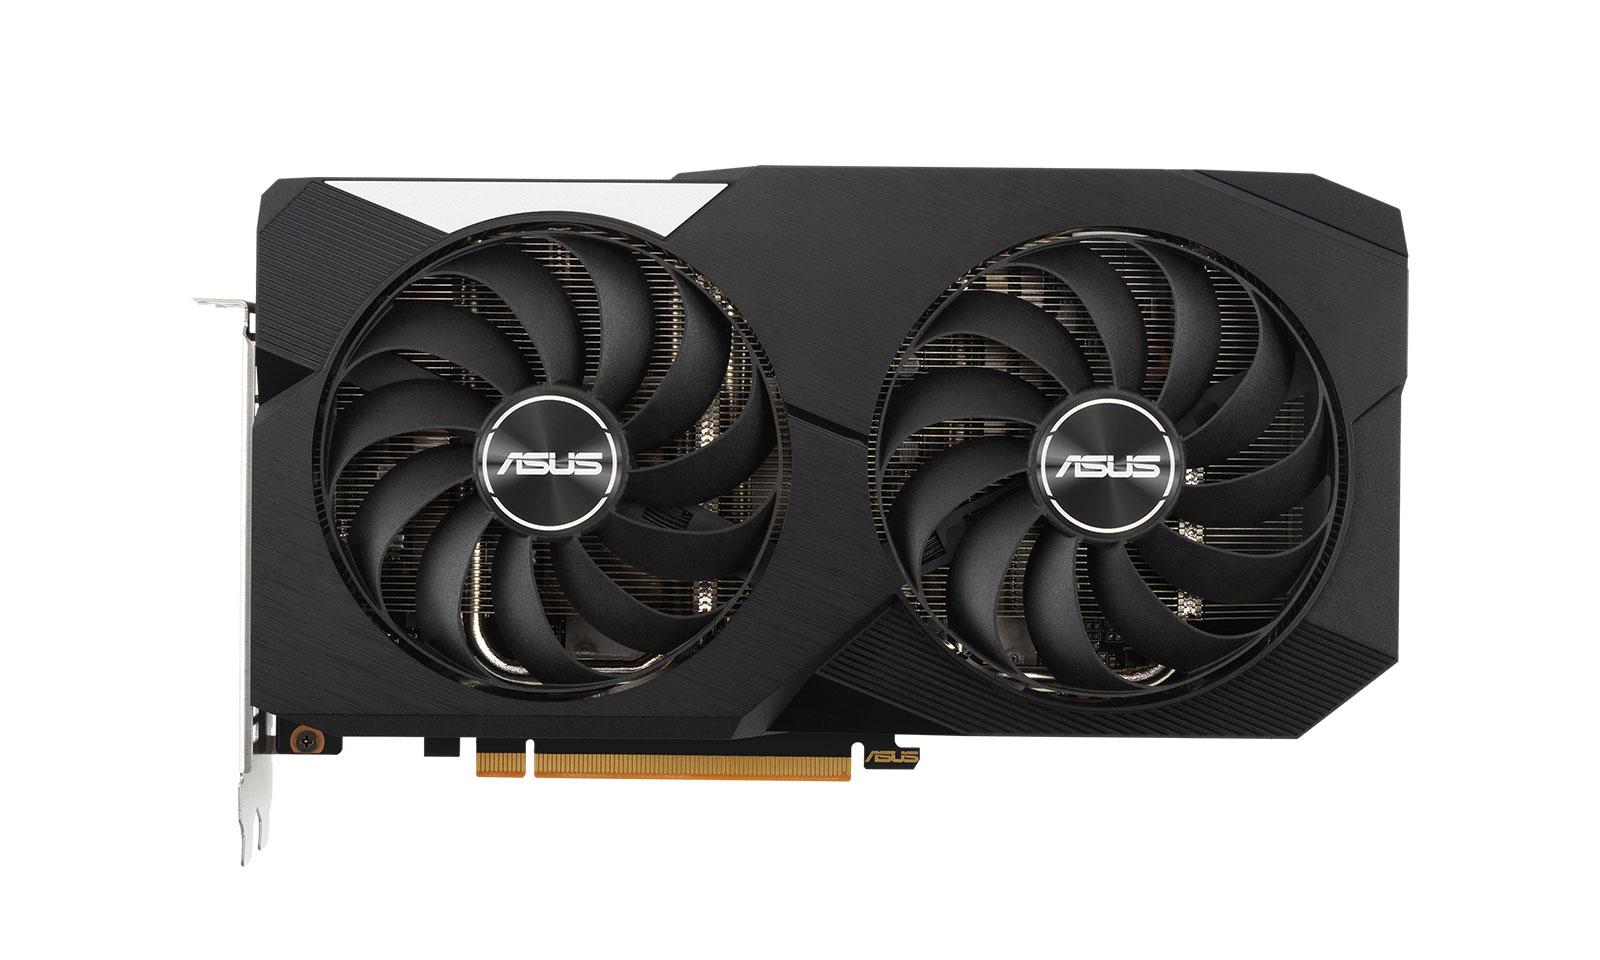 ASUS Dual AMD Radeon RX 6600 XT OC